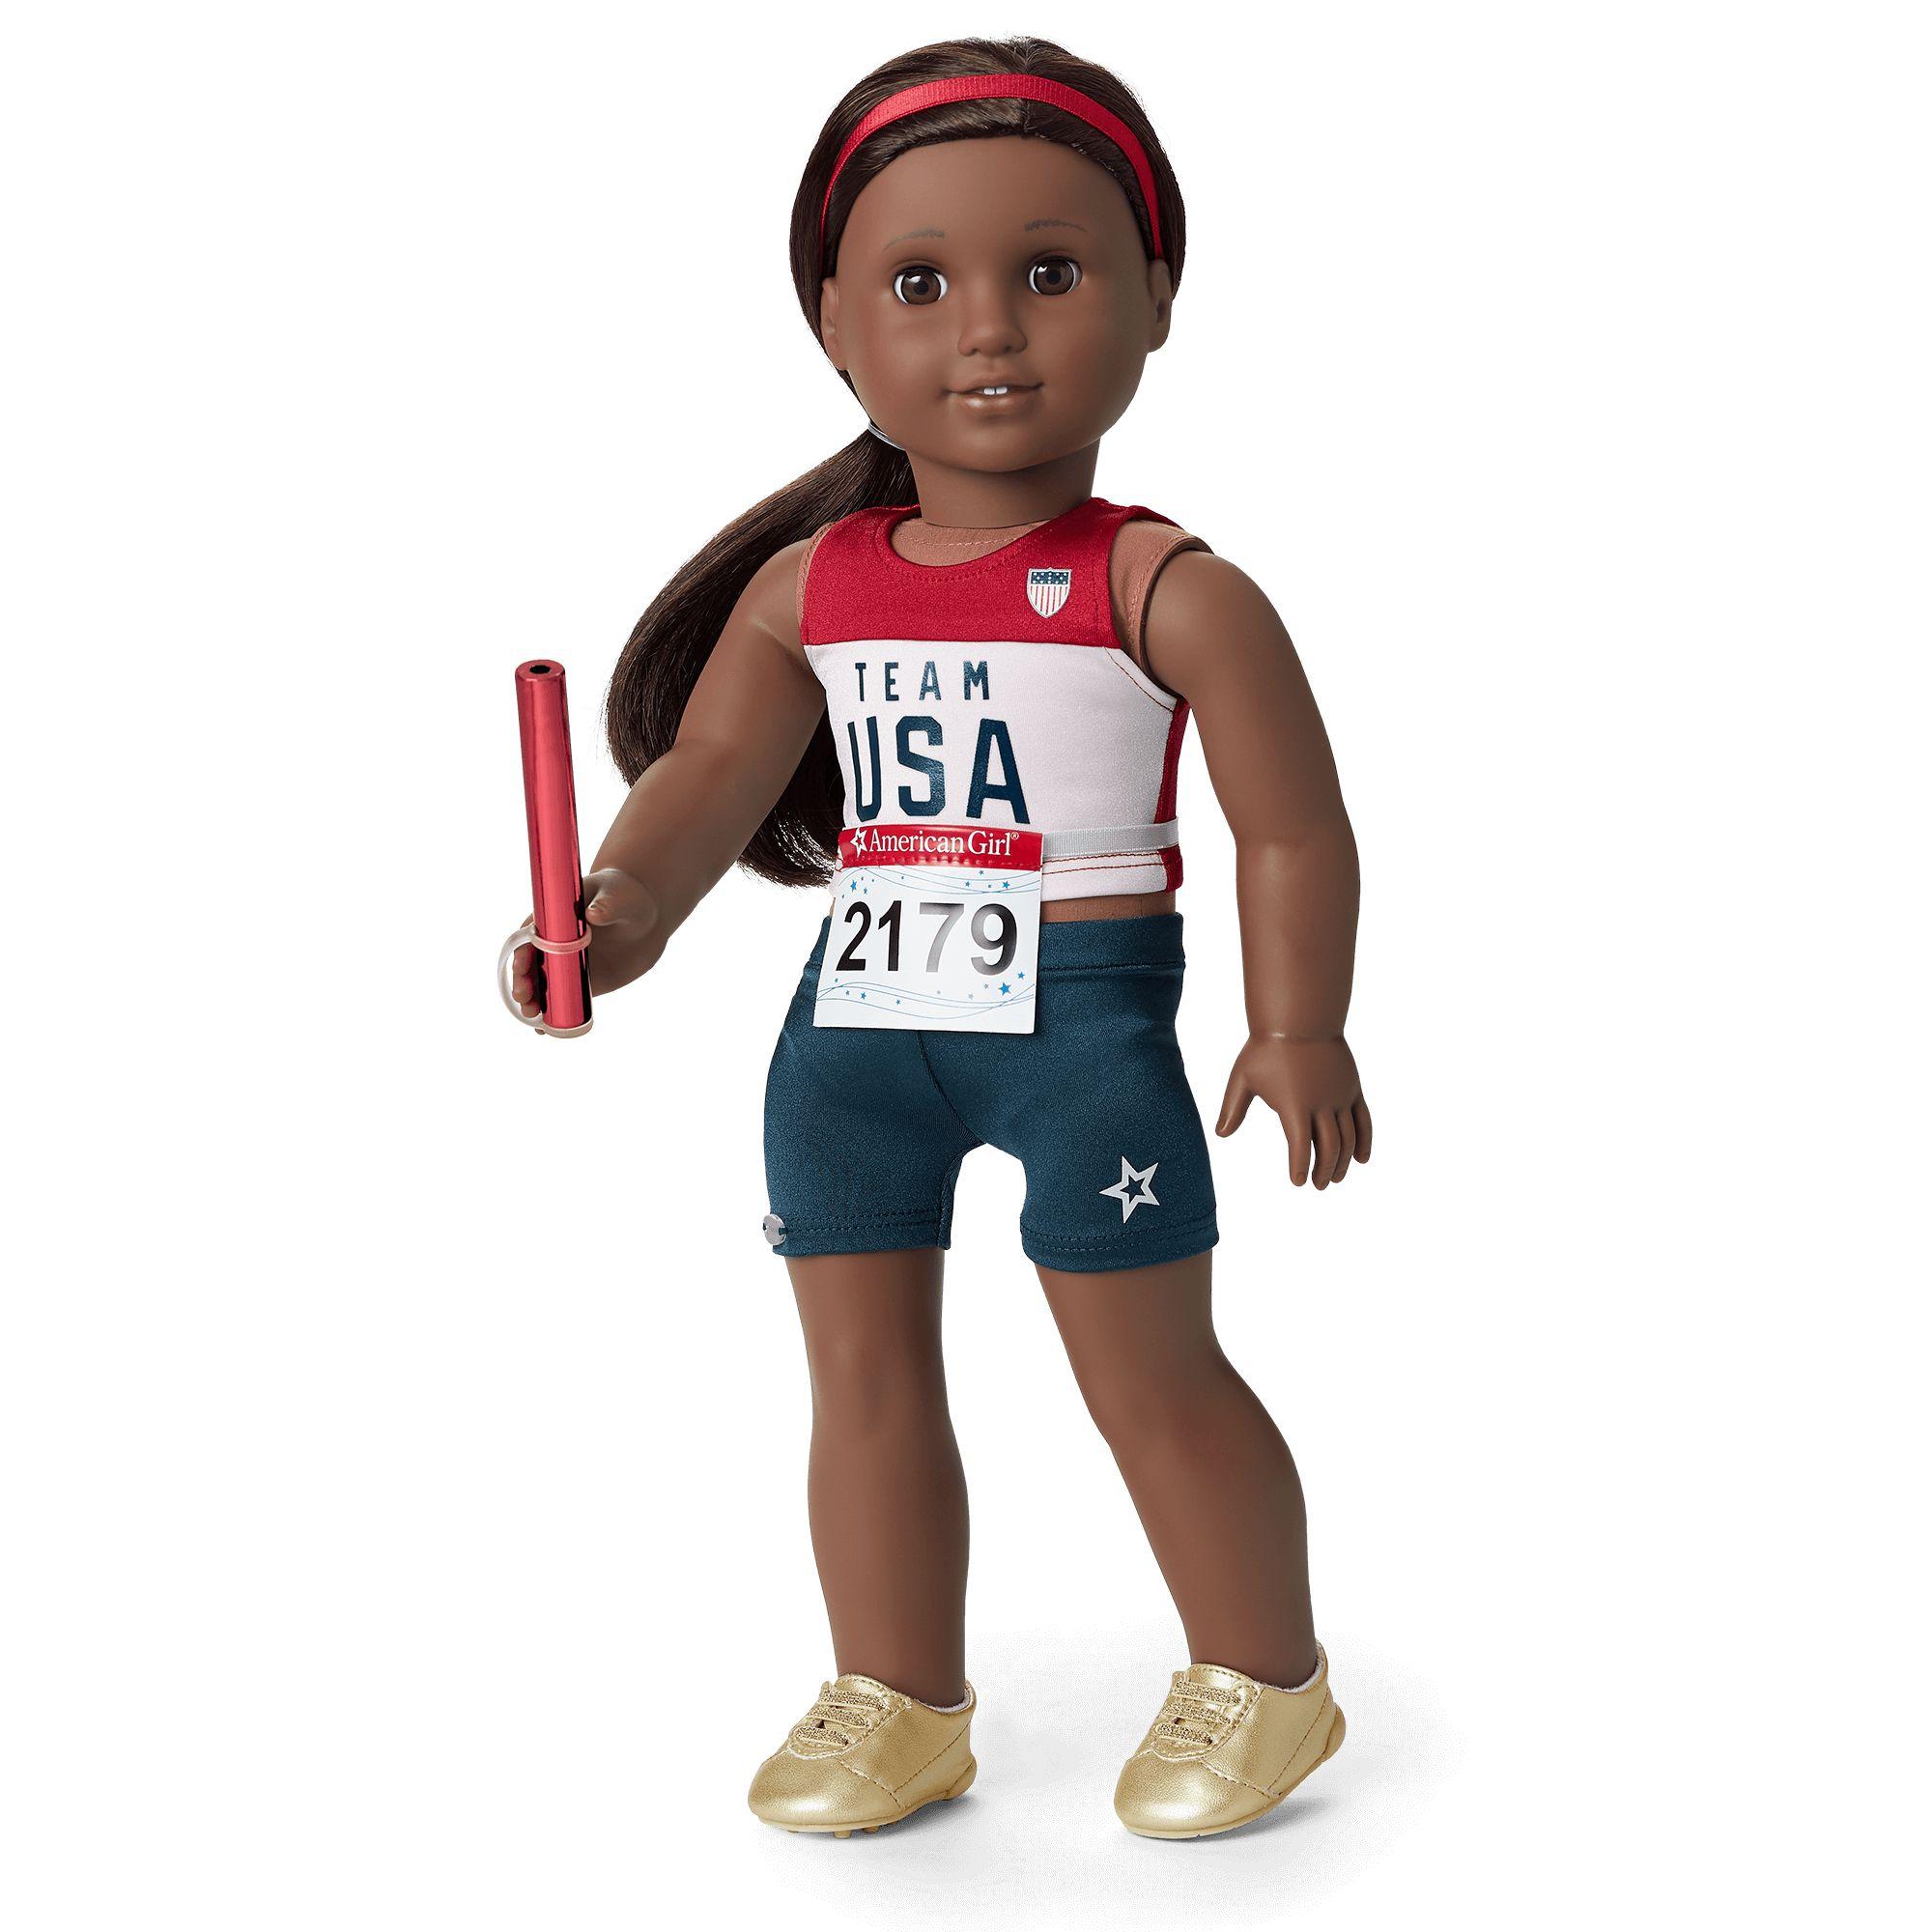 Team USA Track and Field Set